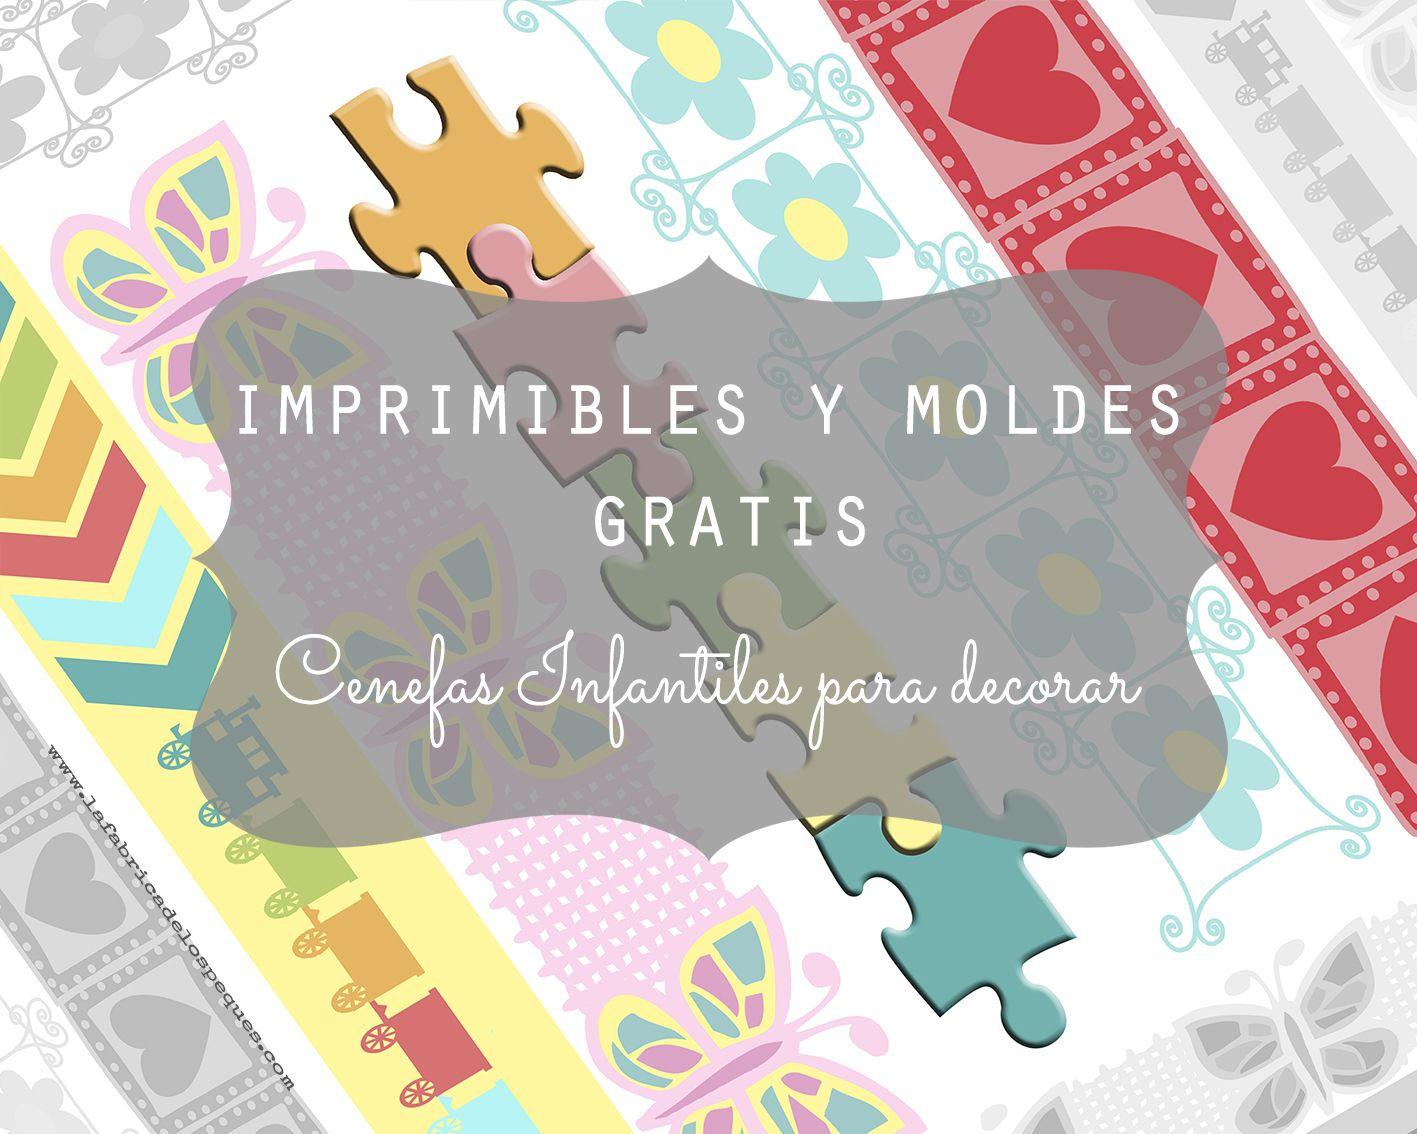 Imprimibles y moldes gratis: cenefas infantiles para decorar ...